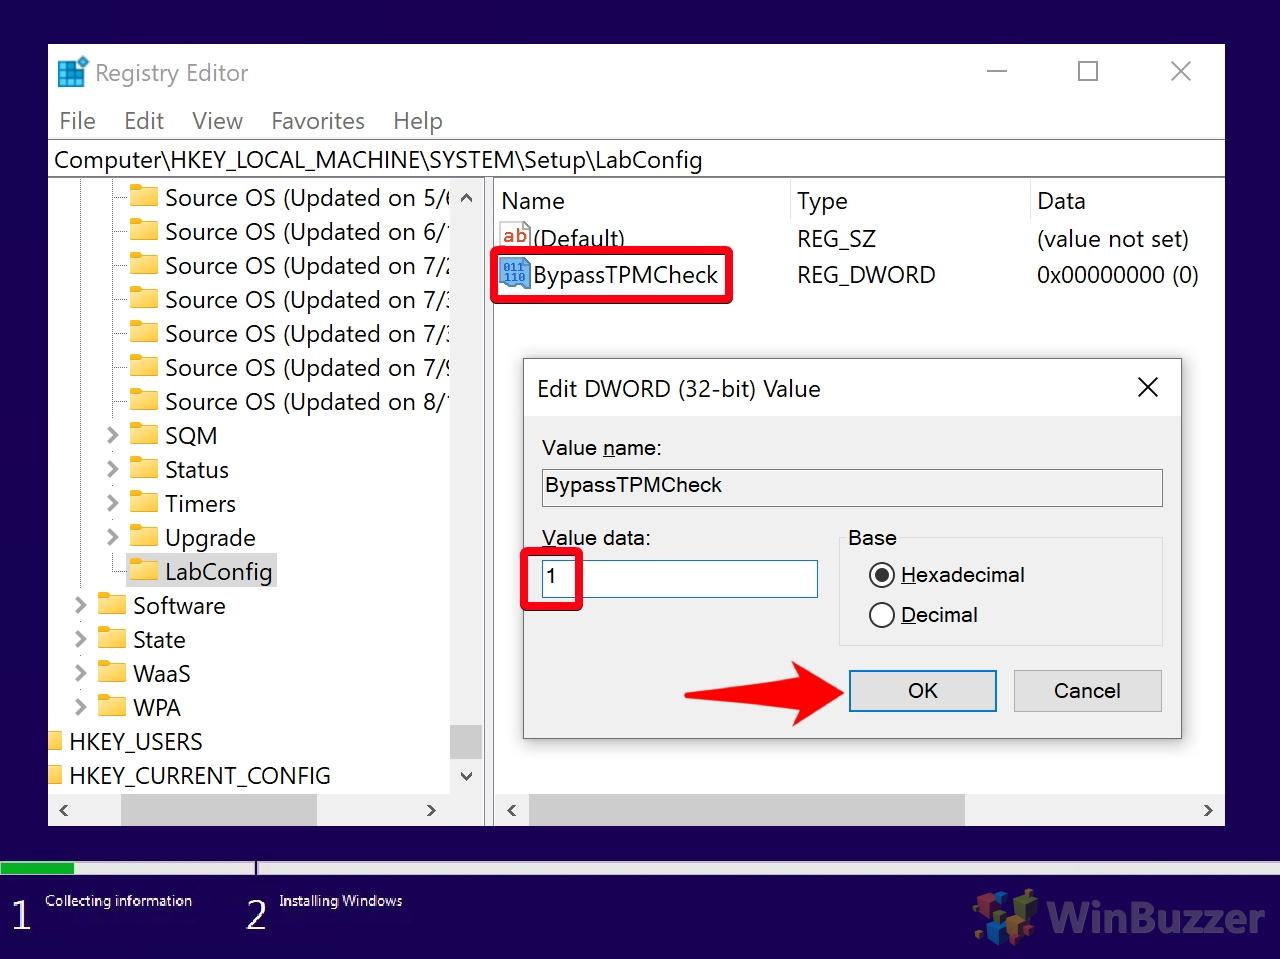 Windows 10 - Windows Setup - Can´t run Windows 10 - Command Prompt - Registry Editor - Navigate to - Setup - LabConfig - New DWORD - BypassTPMCheck - 1 Value